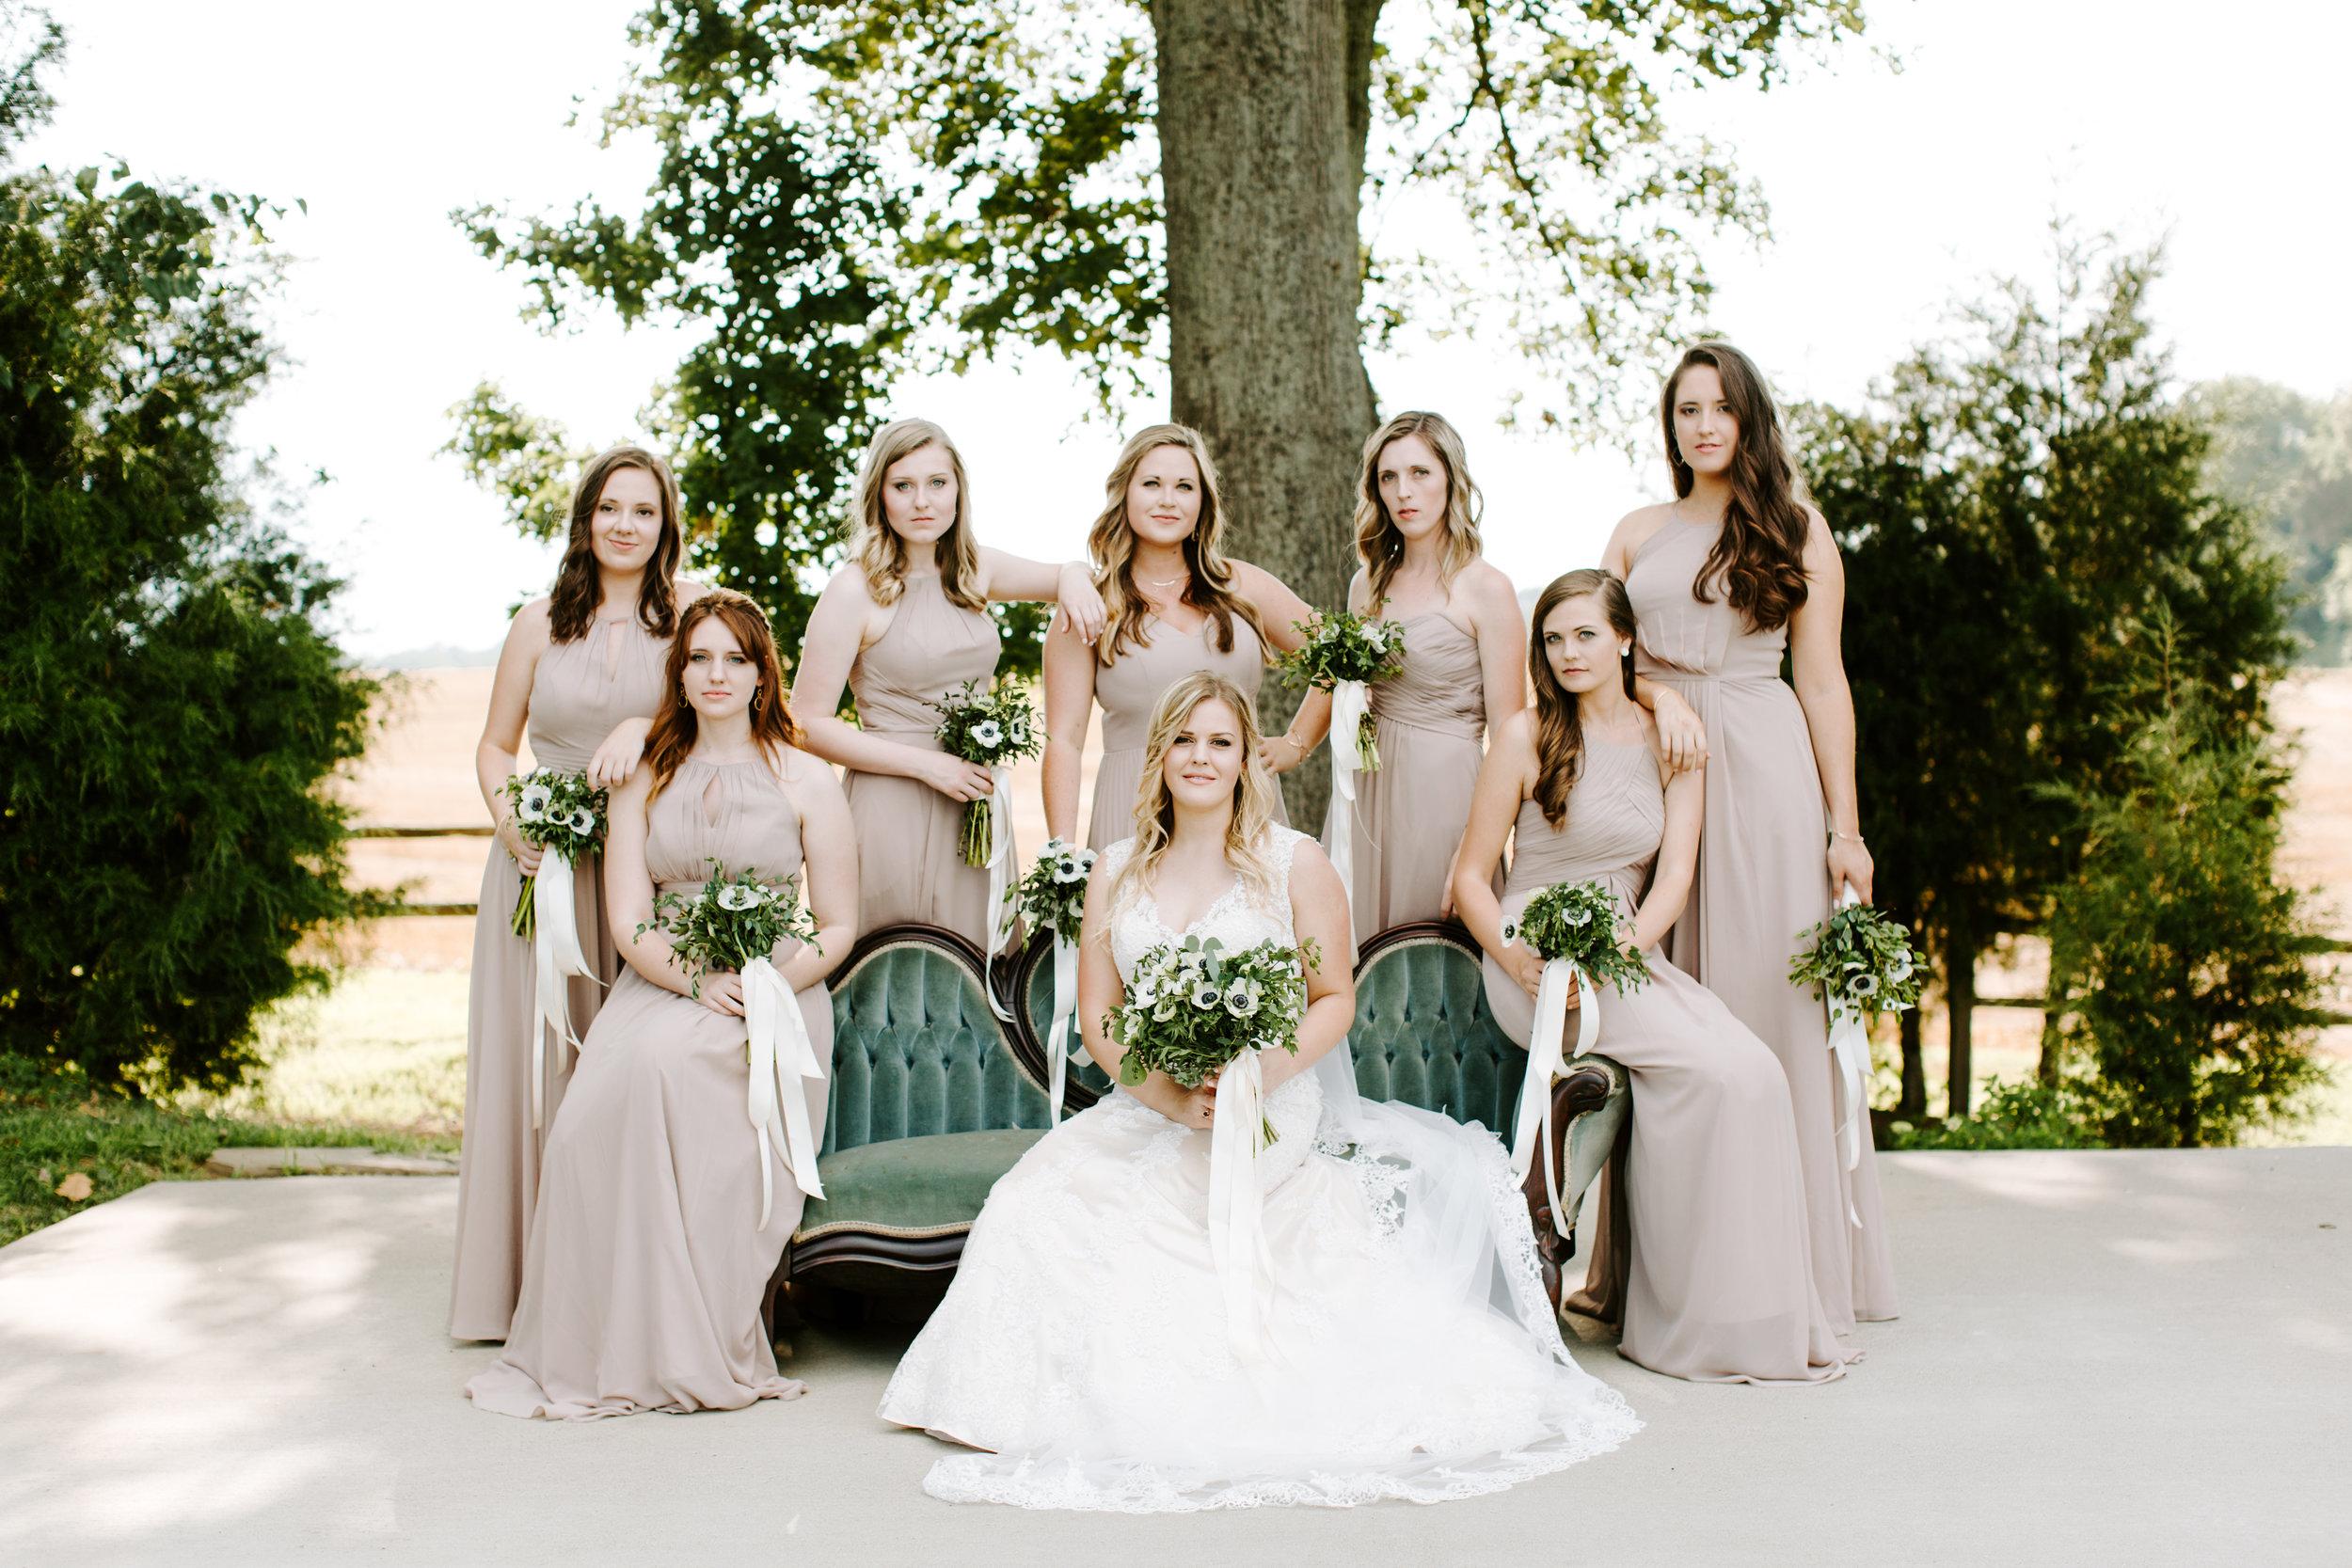 knoxville-wedding-photographer-187.JPG